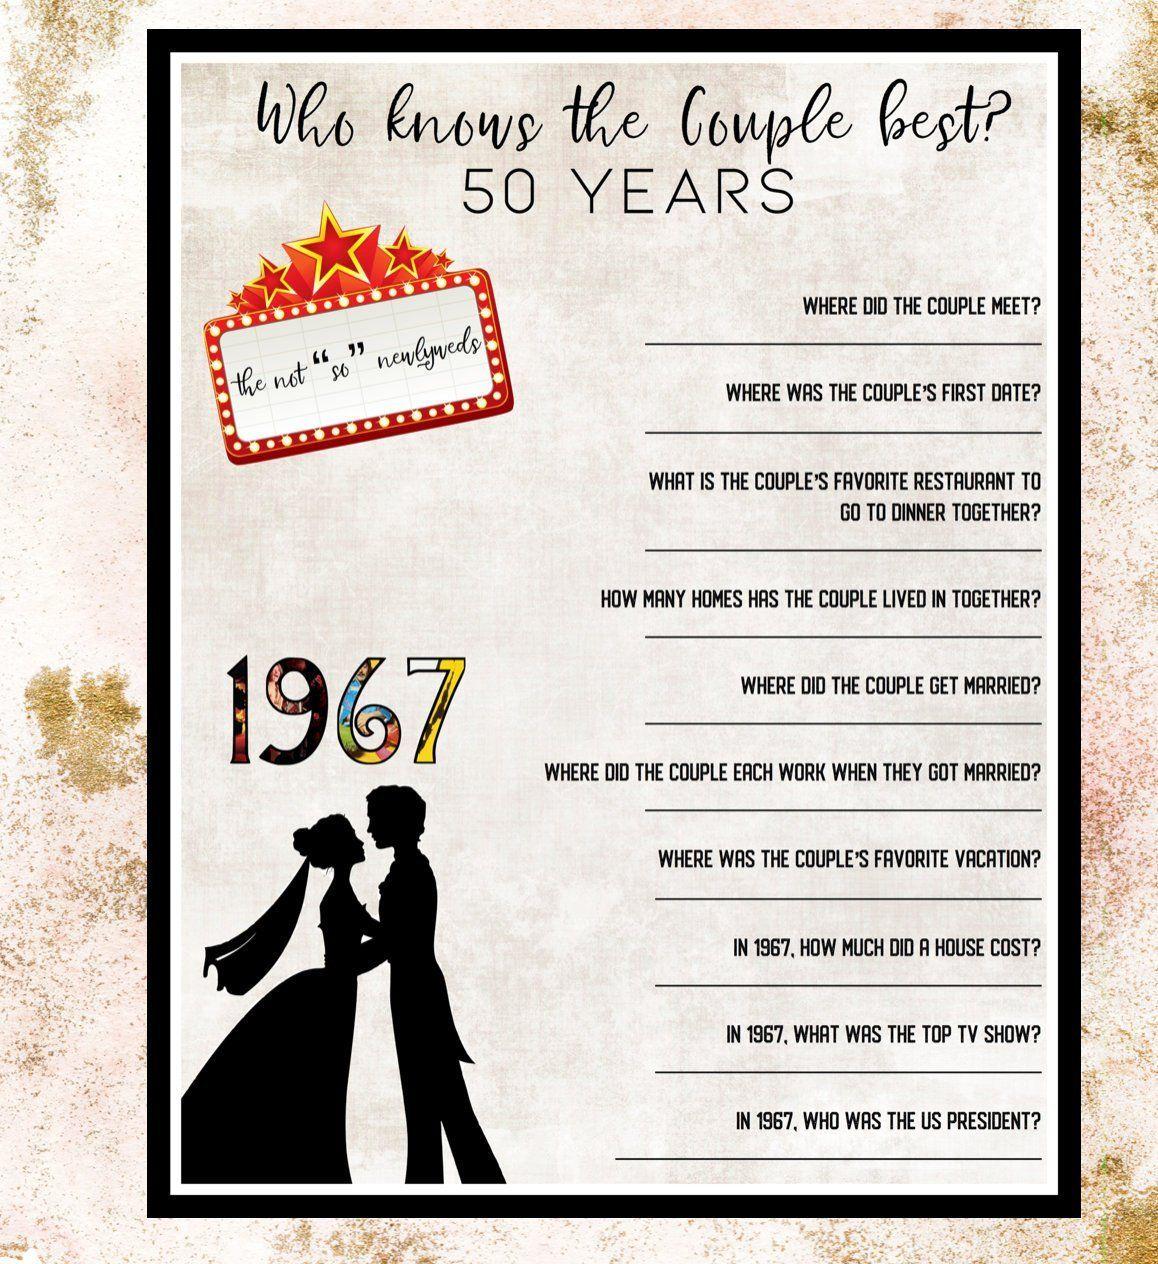 Wedding Anniversary Trivia Game Trivia questions 1967